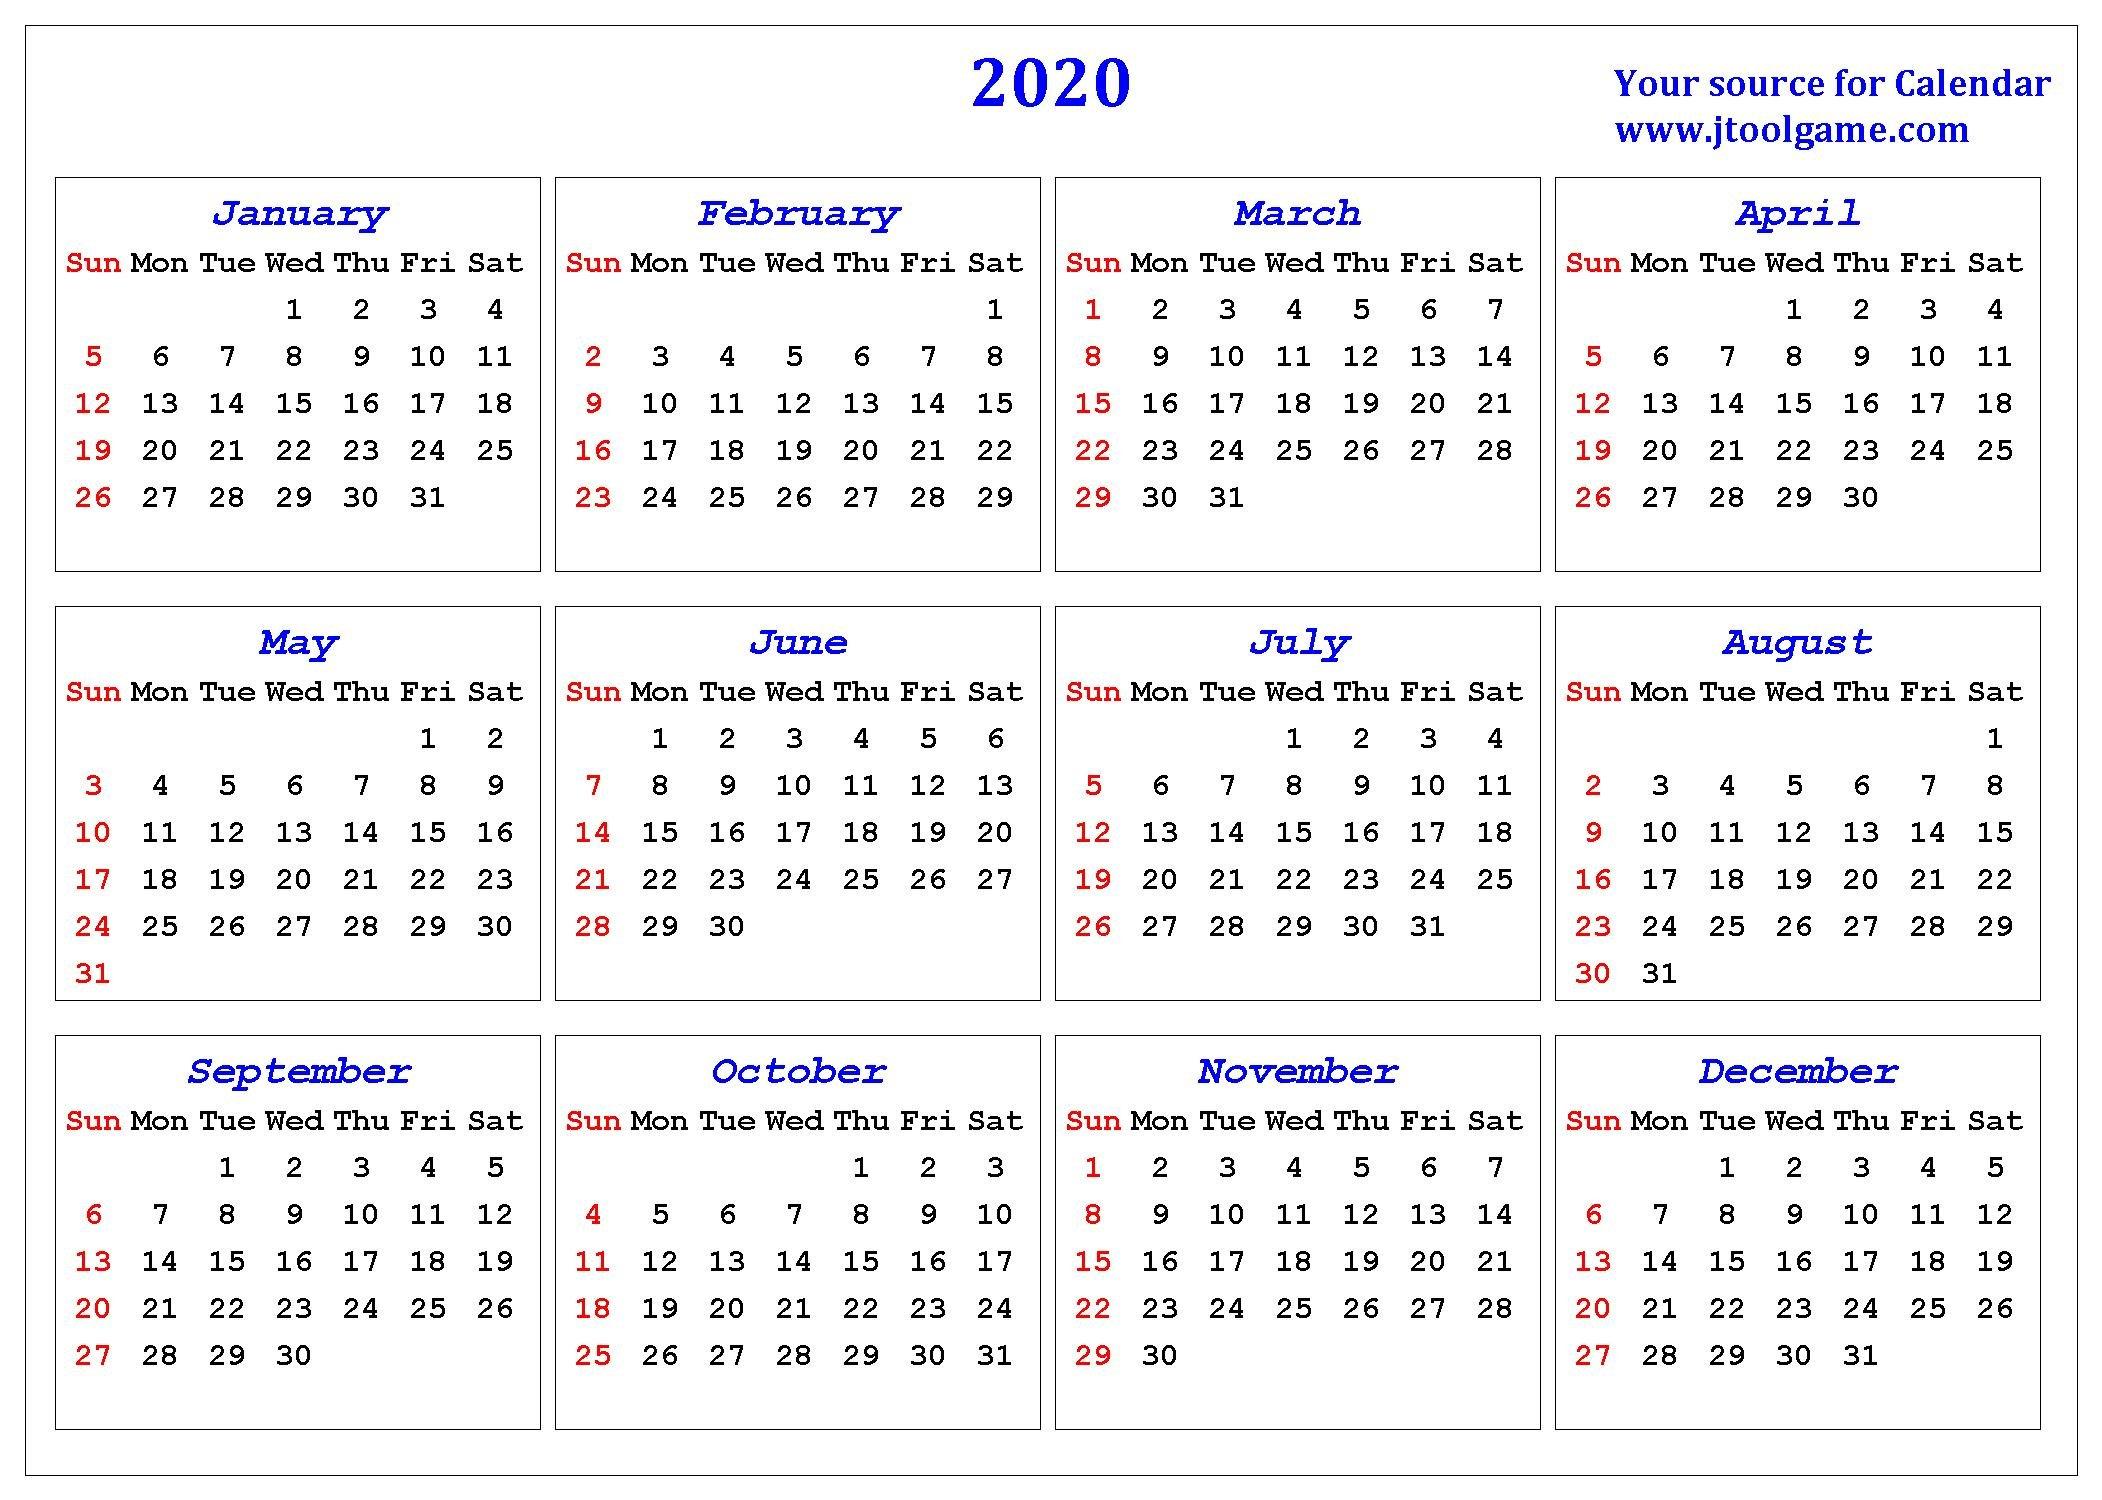 2020 Calendar - Printable Calendar. 2020 Calendar In Free 2020 Calendar With Days Counted 1-365